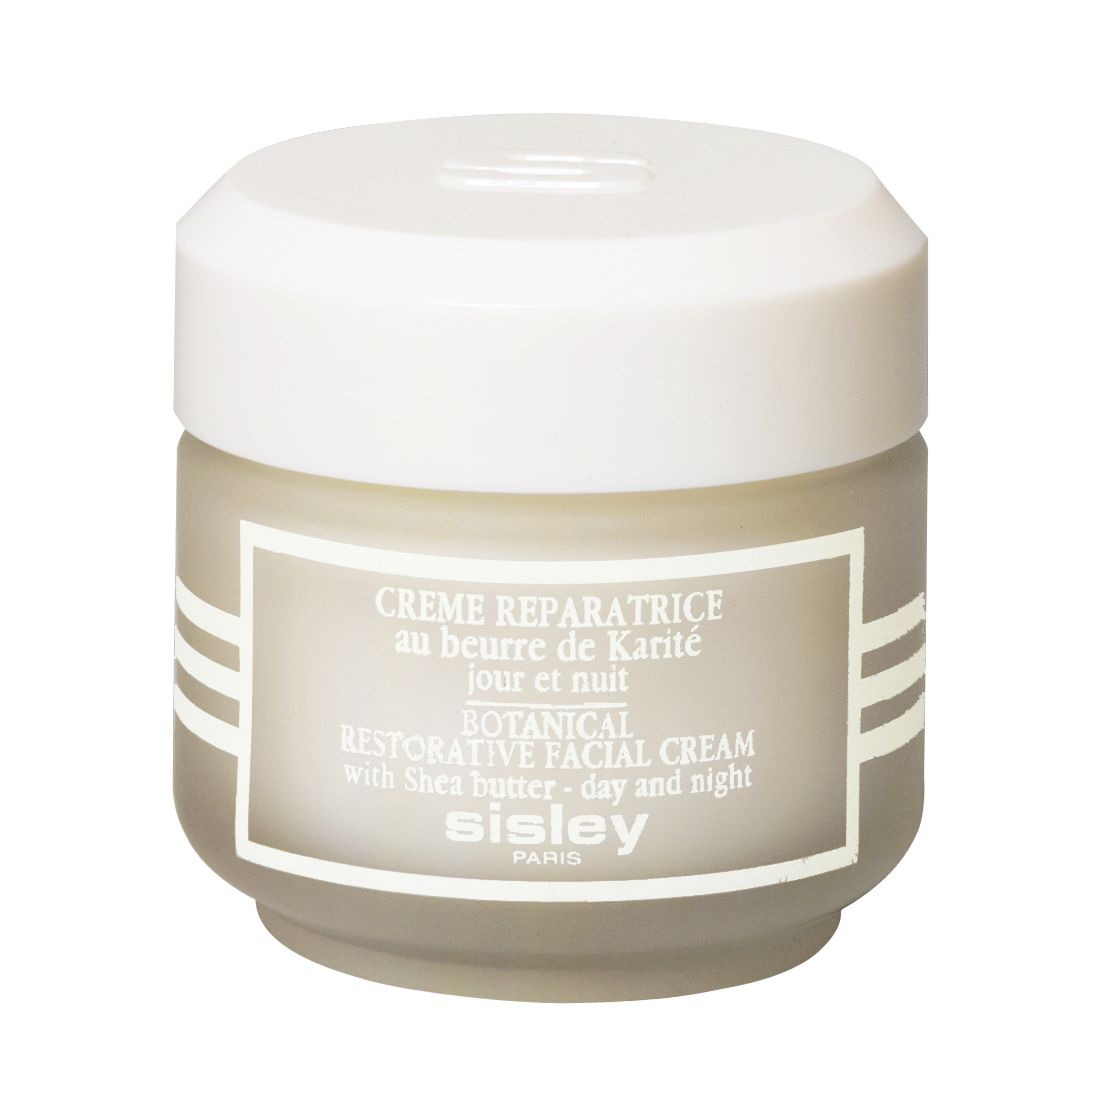 Sisley Sisley Botanical Restorative Face Cream, 50ml